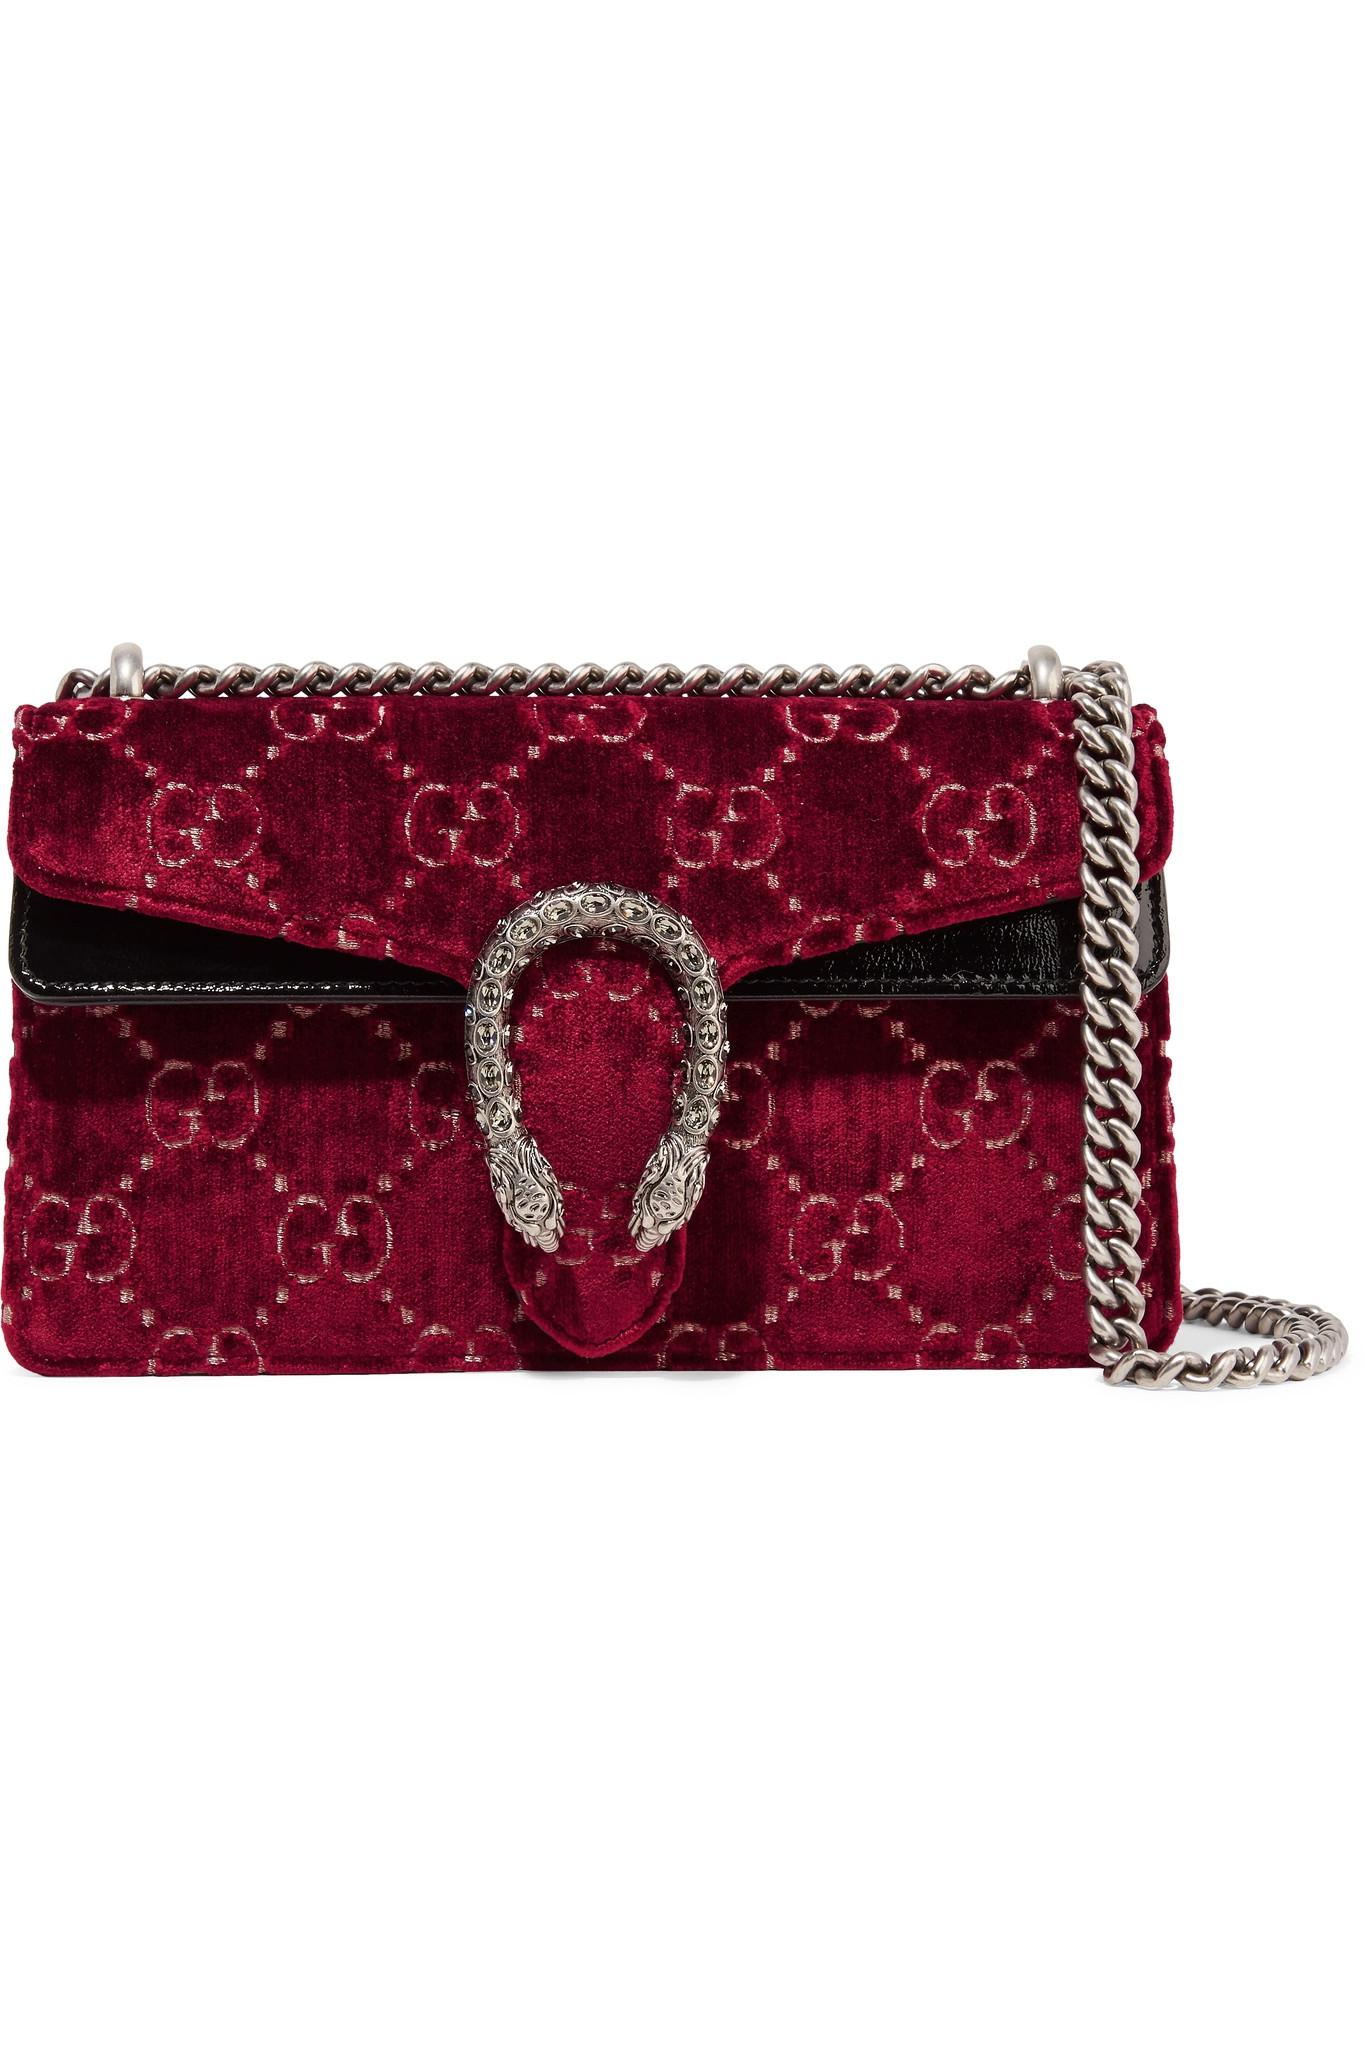 b90be0a1d5ce Gucci Dionysus Patent Leather-trimmed Embossed Velvet Shoulder Bag ...